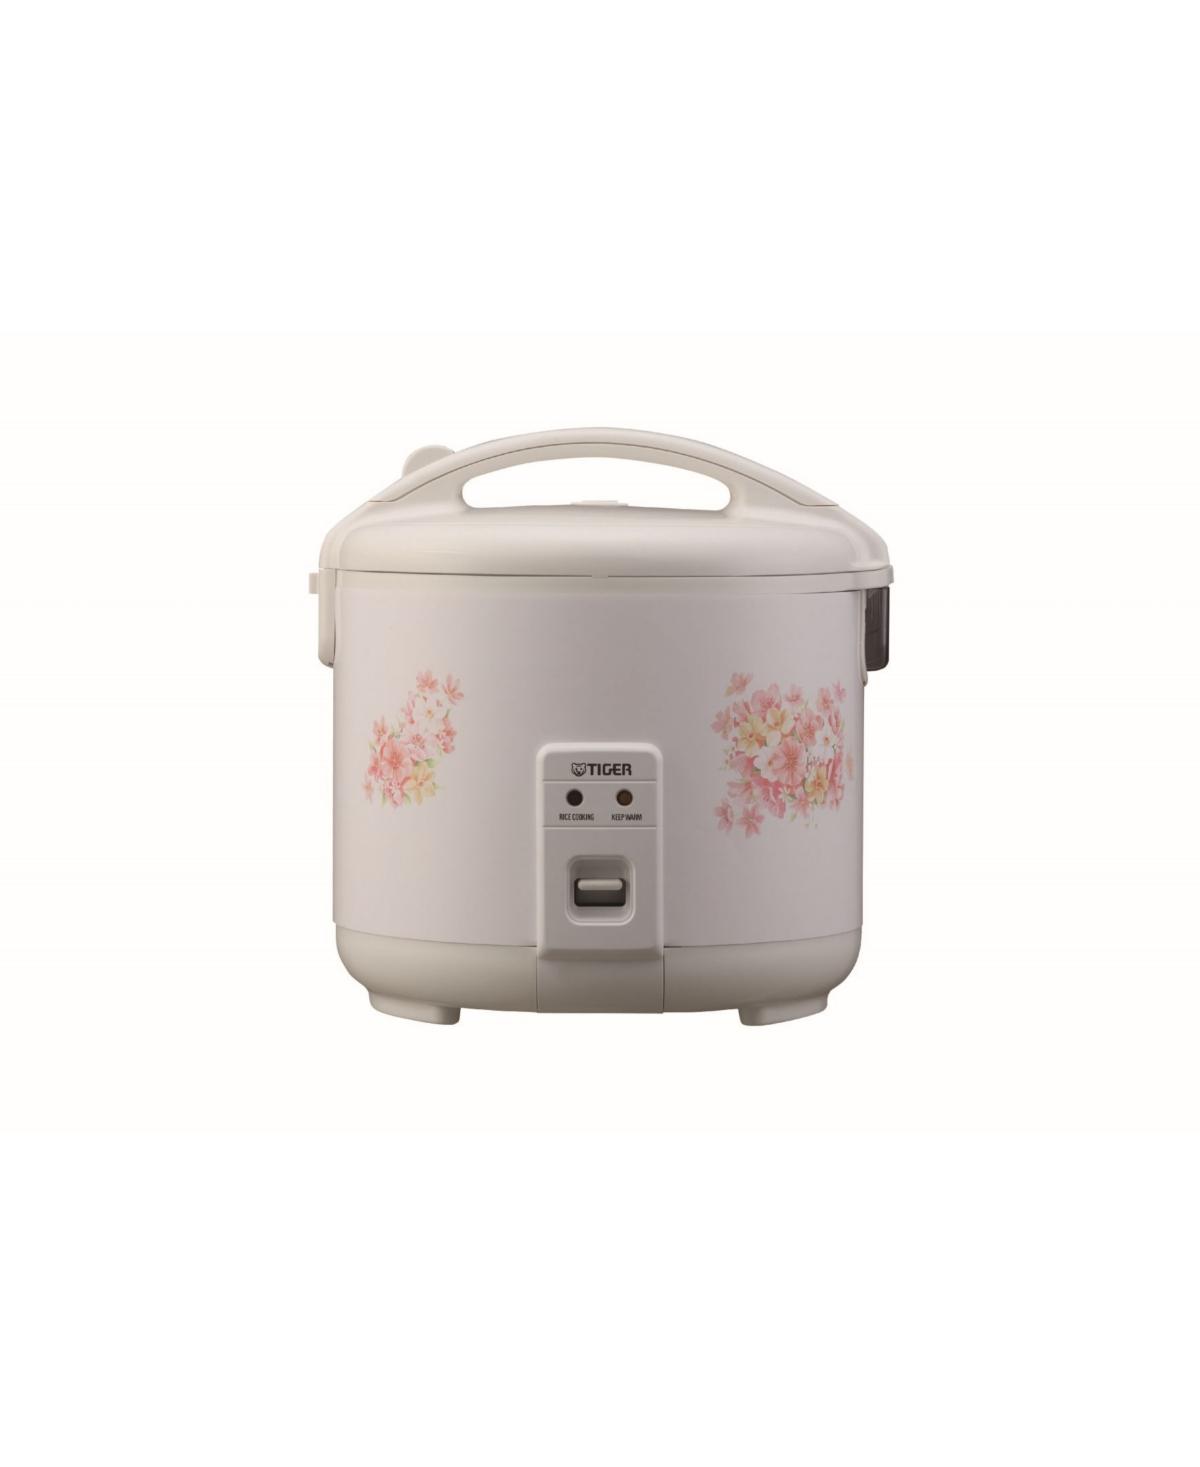 Tiger Jnp1500 Rice Cooker 8 Cup